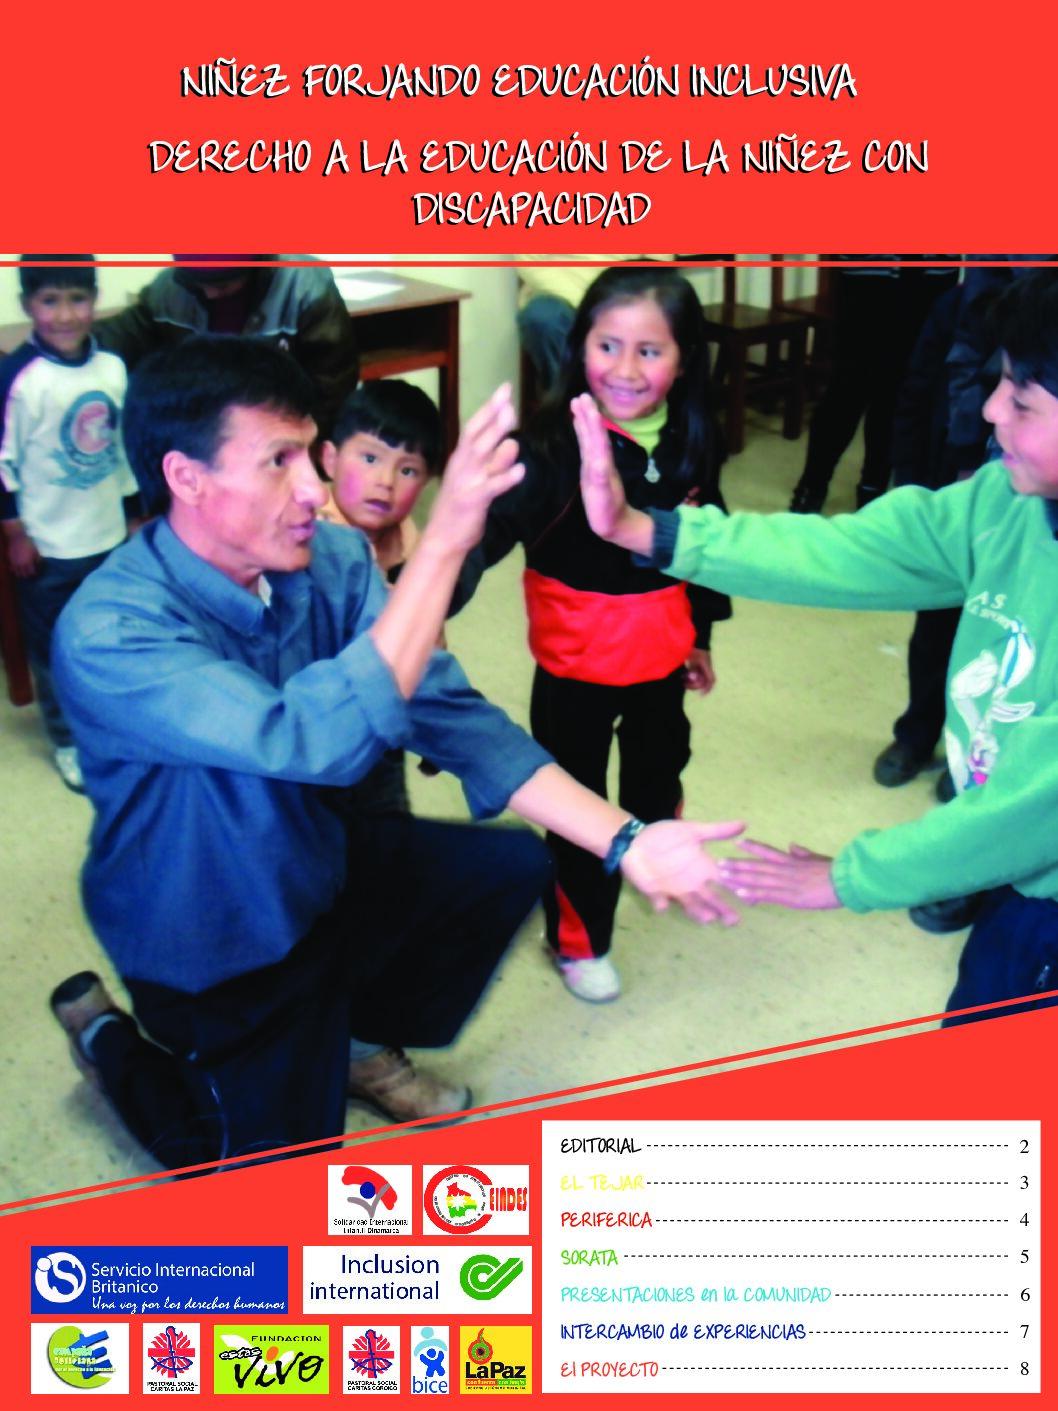 Boletín: Niñez forjando educación inclusiva